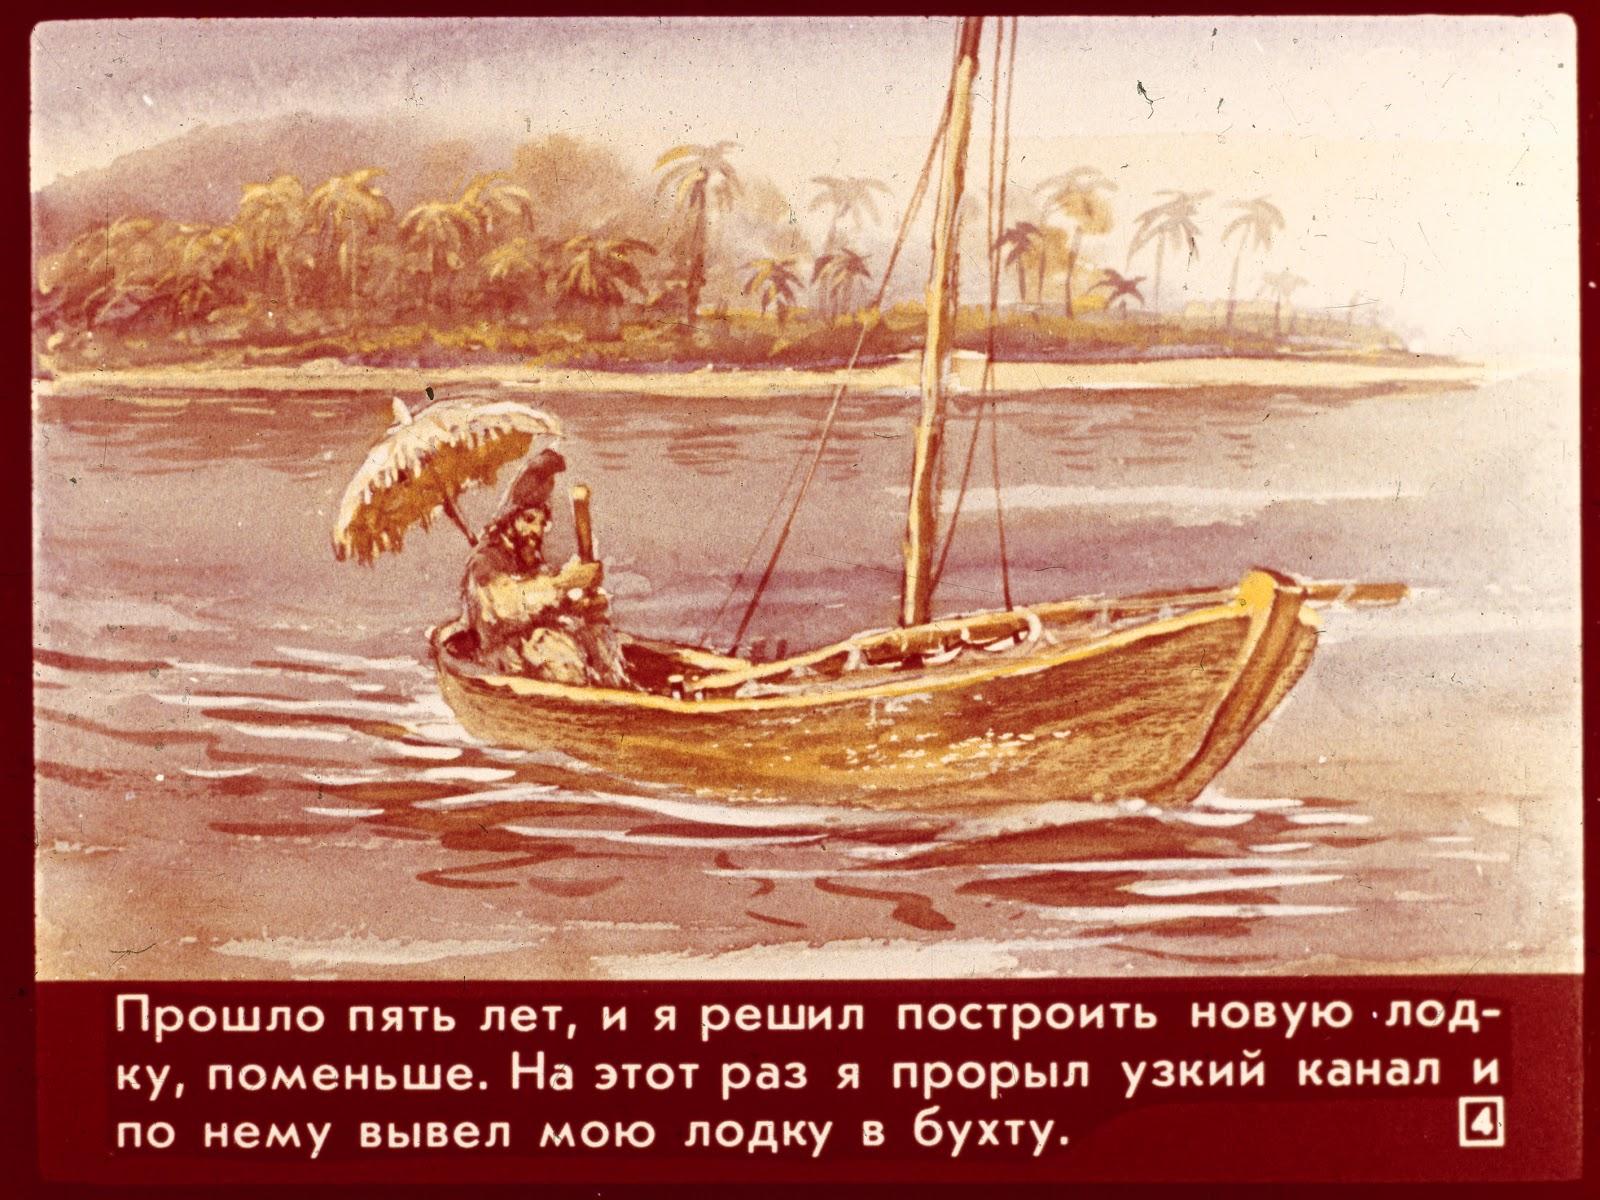 робинзон крузо строит лодку изложение